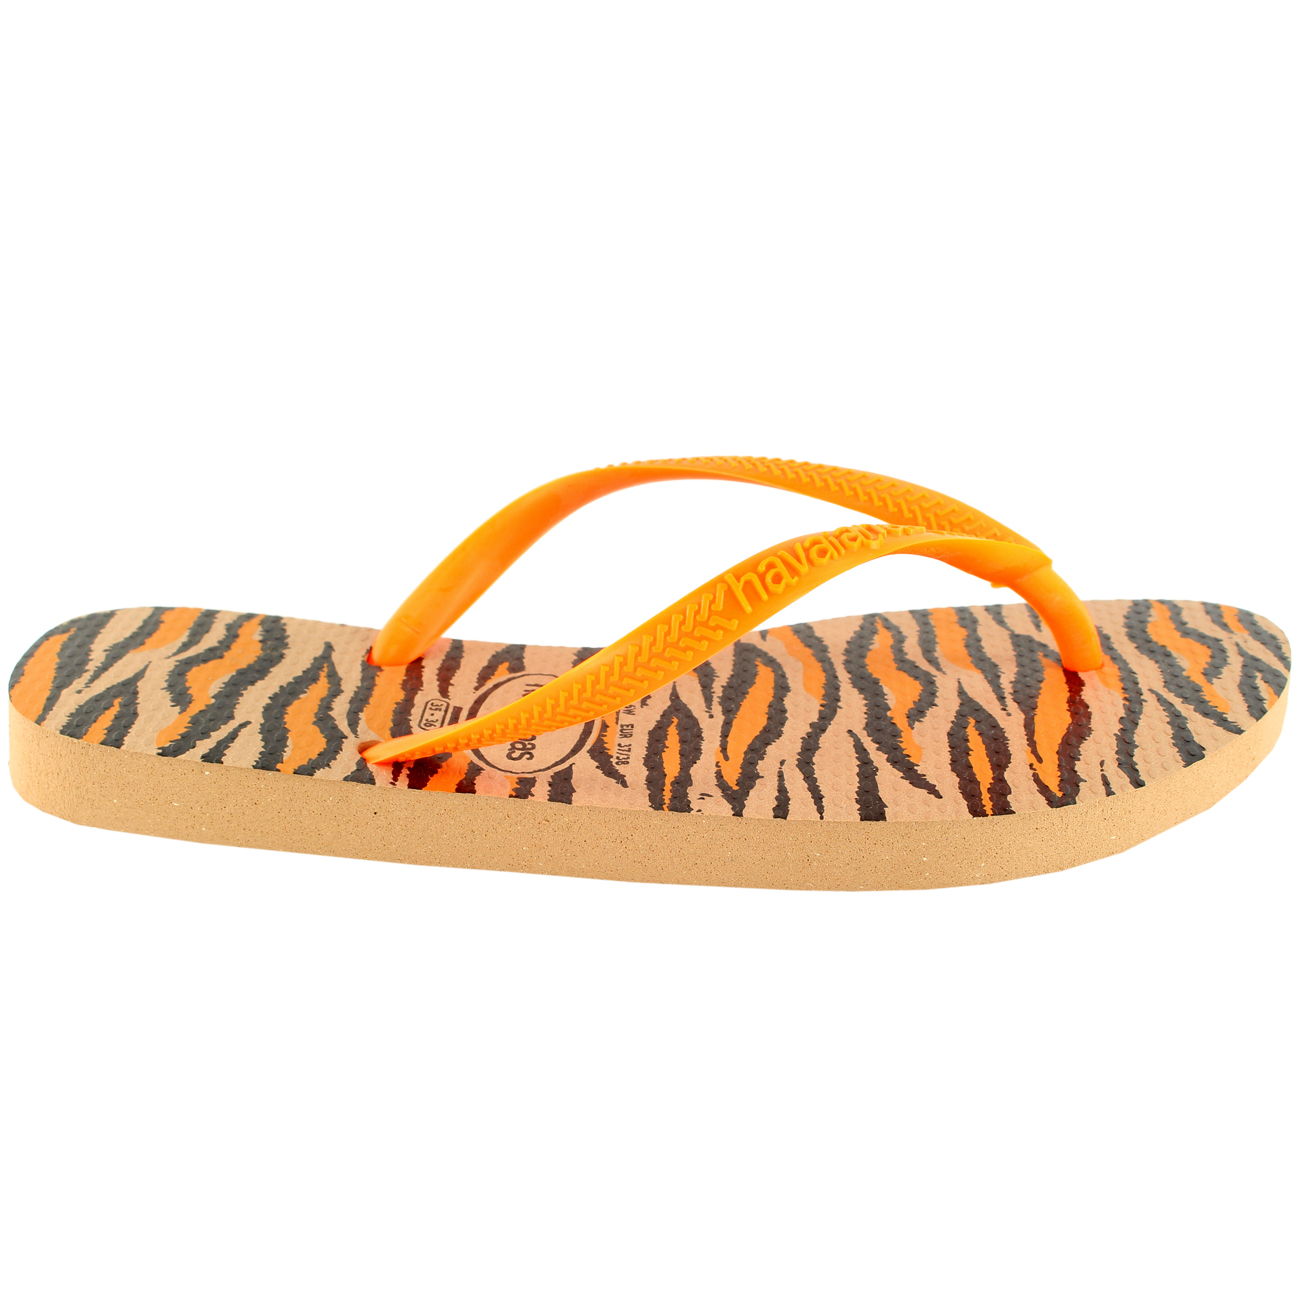 f50544e595049 Womens Havaianas Slim Animals Fluo Flip Flop Summer Beach Sandal UK Sizes  1-8